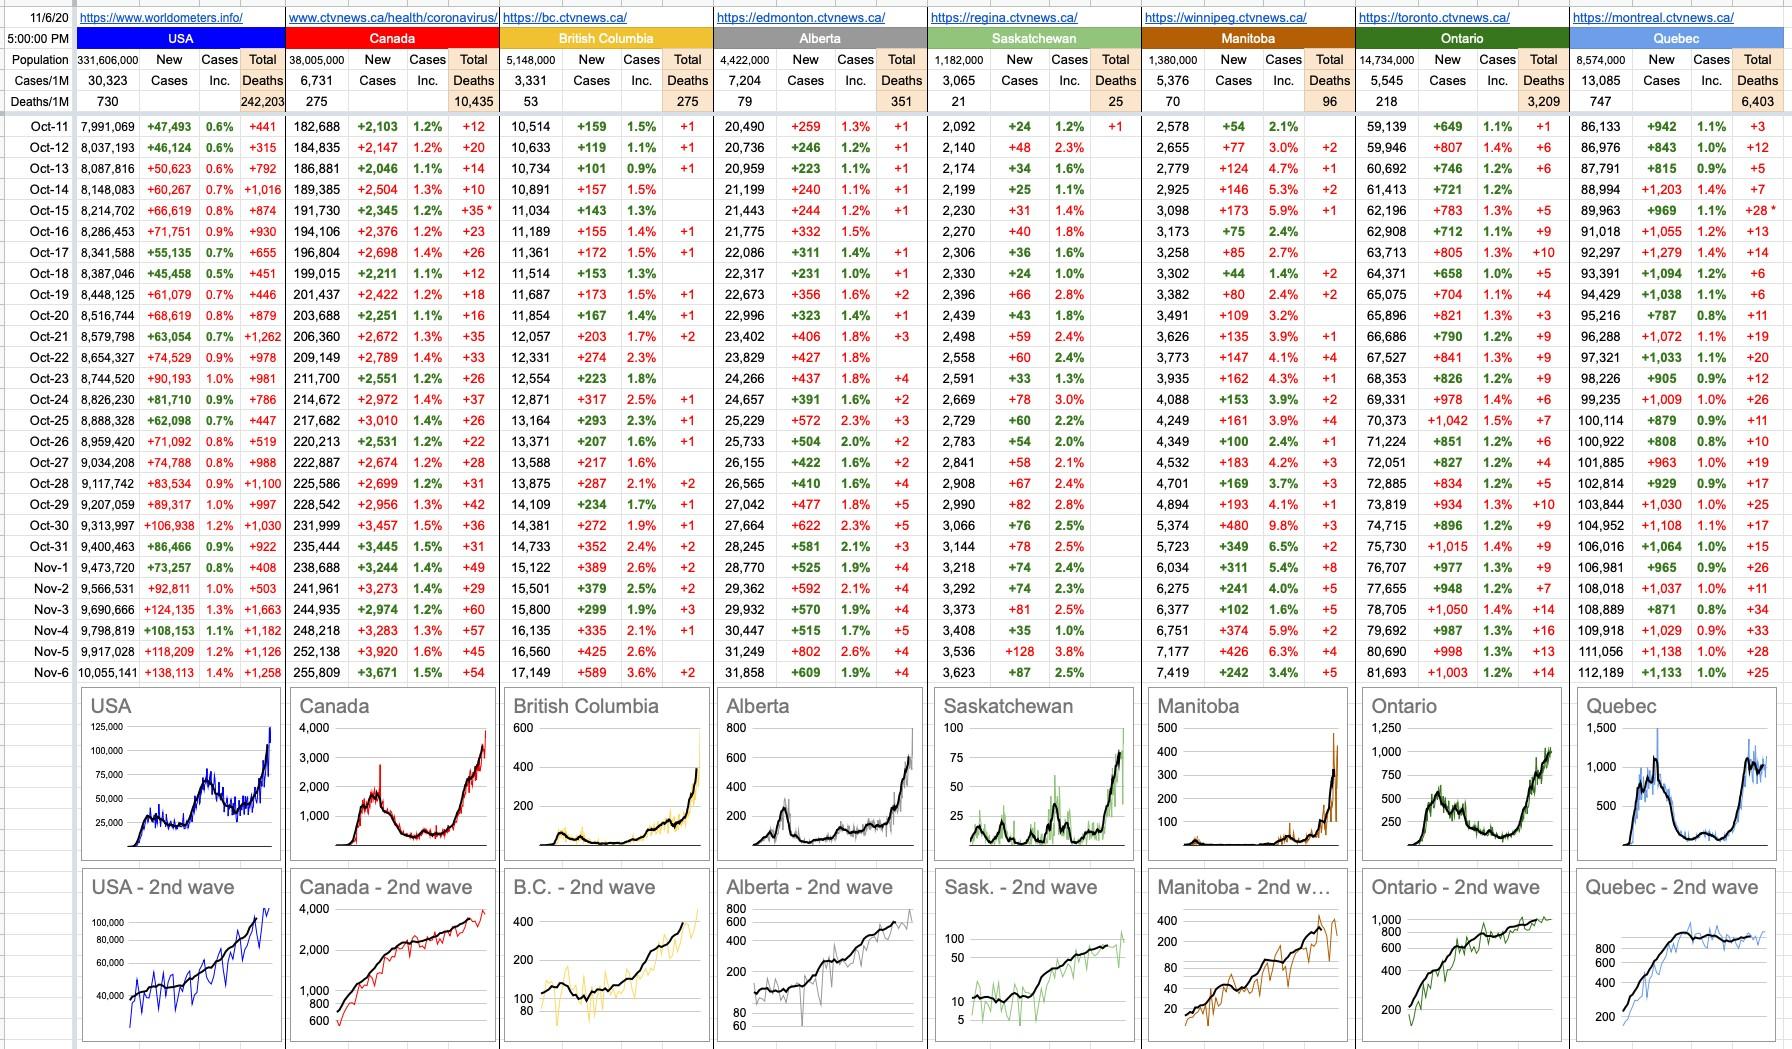 HK COVID-19 Daily Report - Graph for Nov 6, 2020